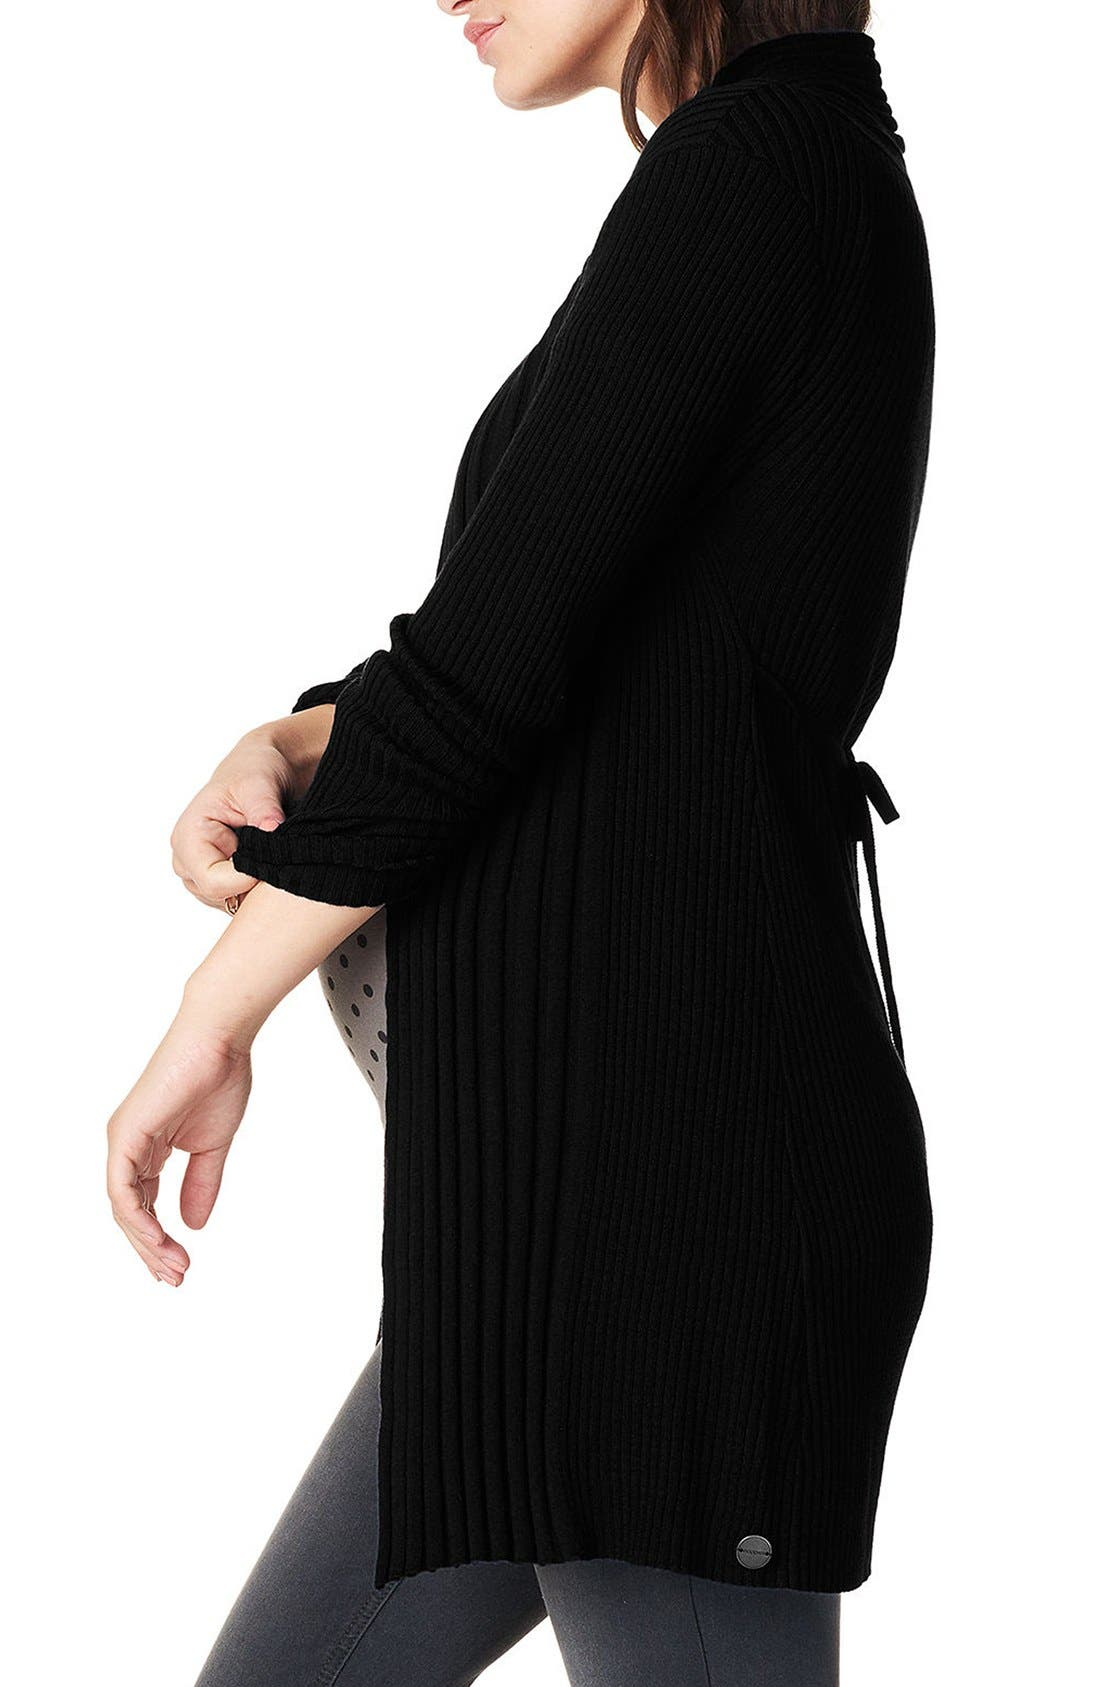 'Anne' Rib Knit Maternity Cardigan,                             Alternate thumbnail 4, color,                             Black